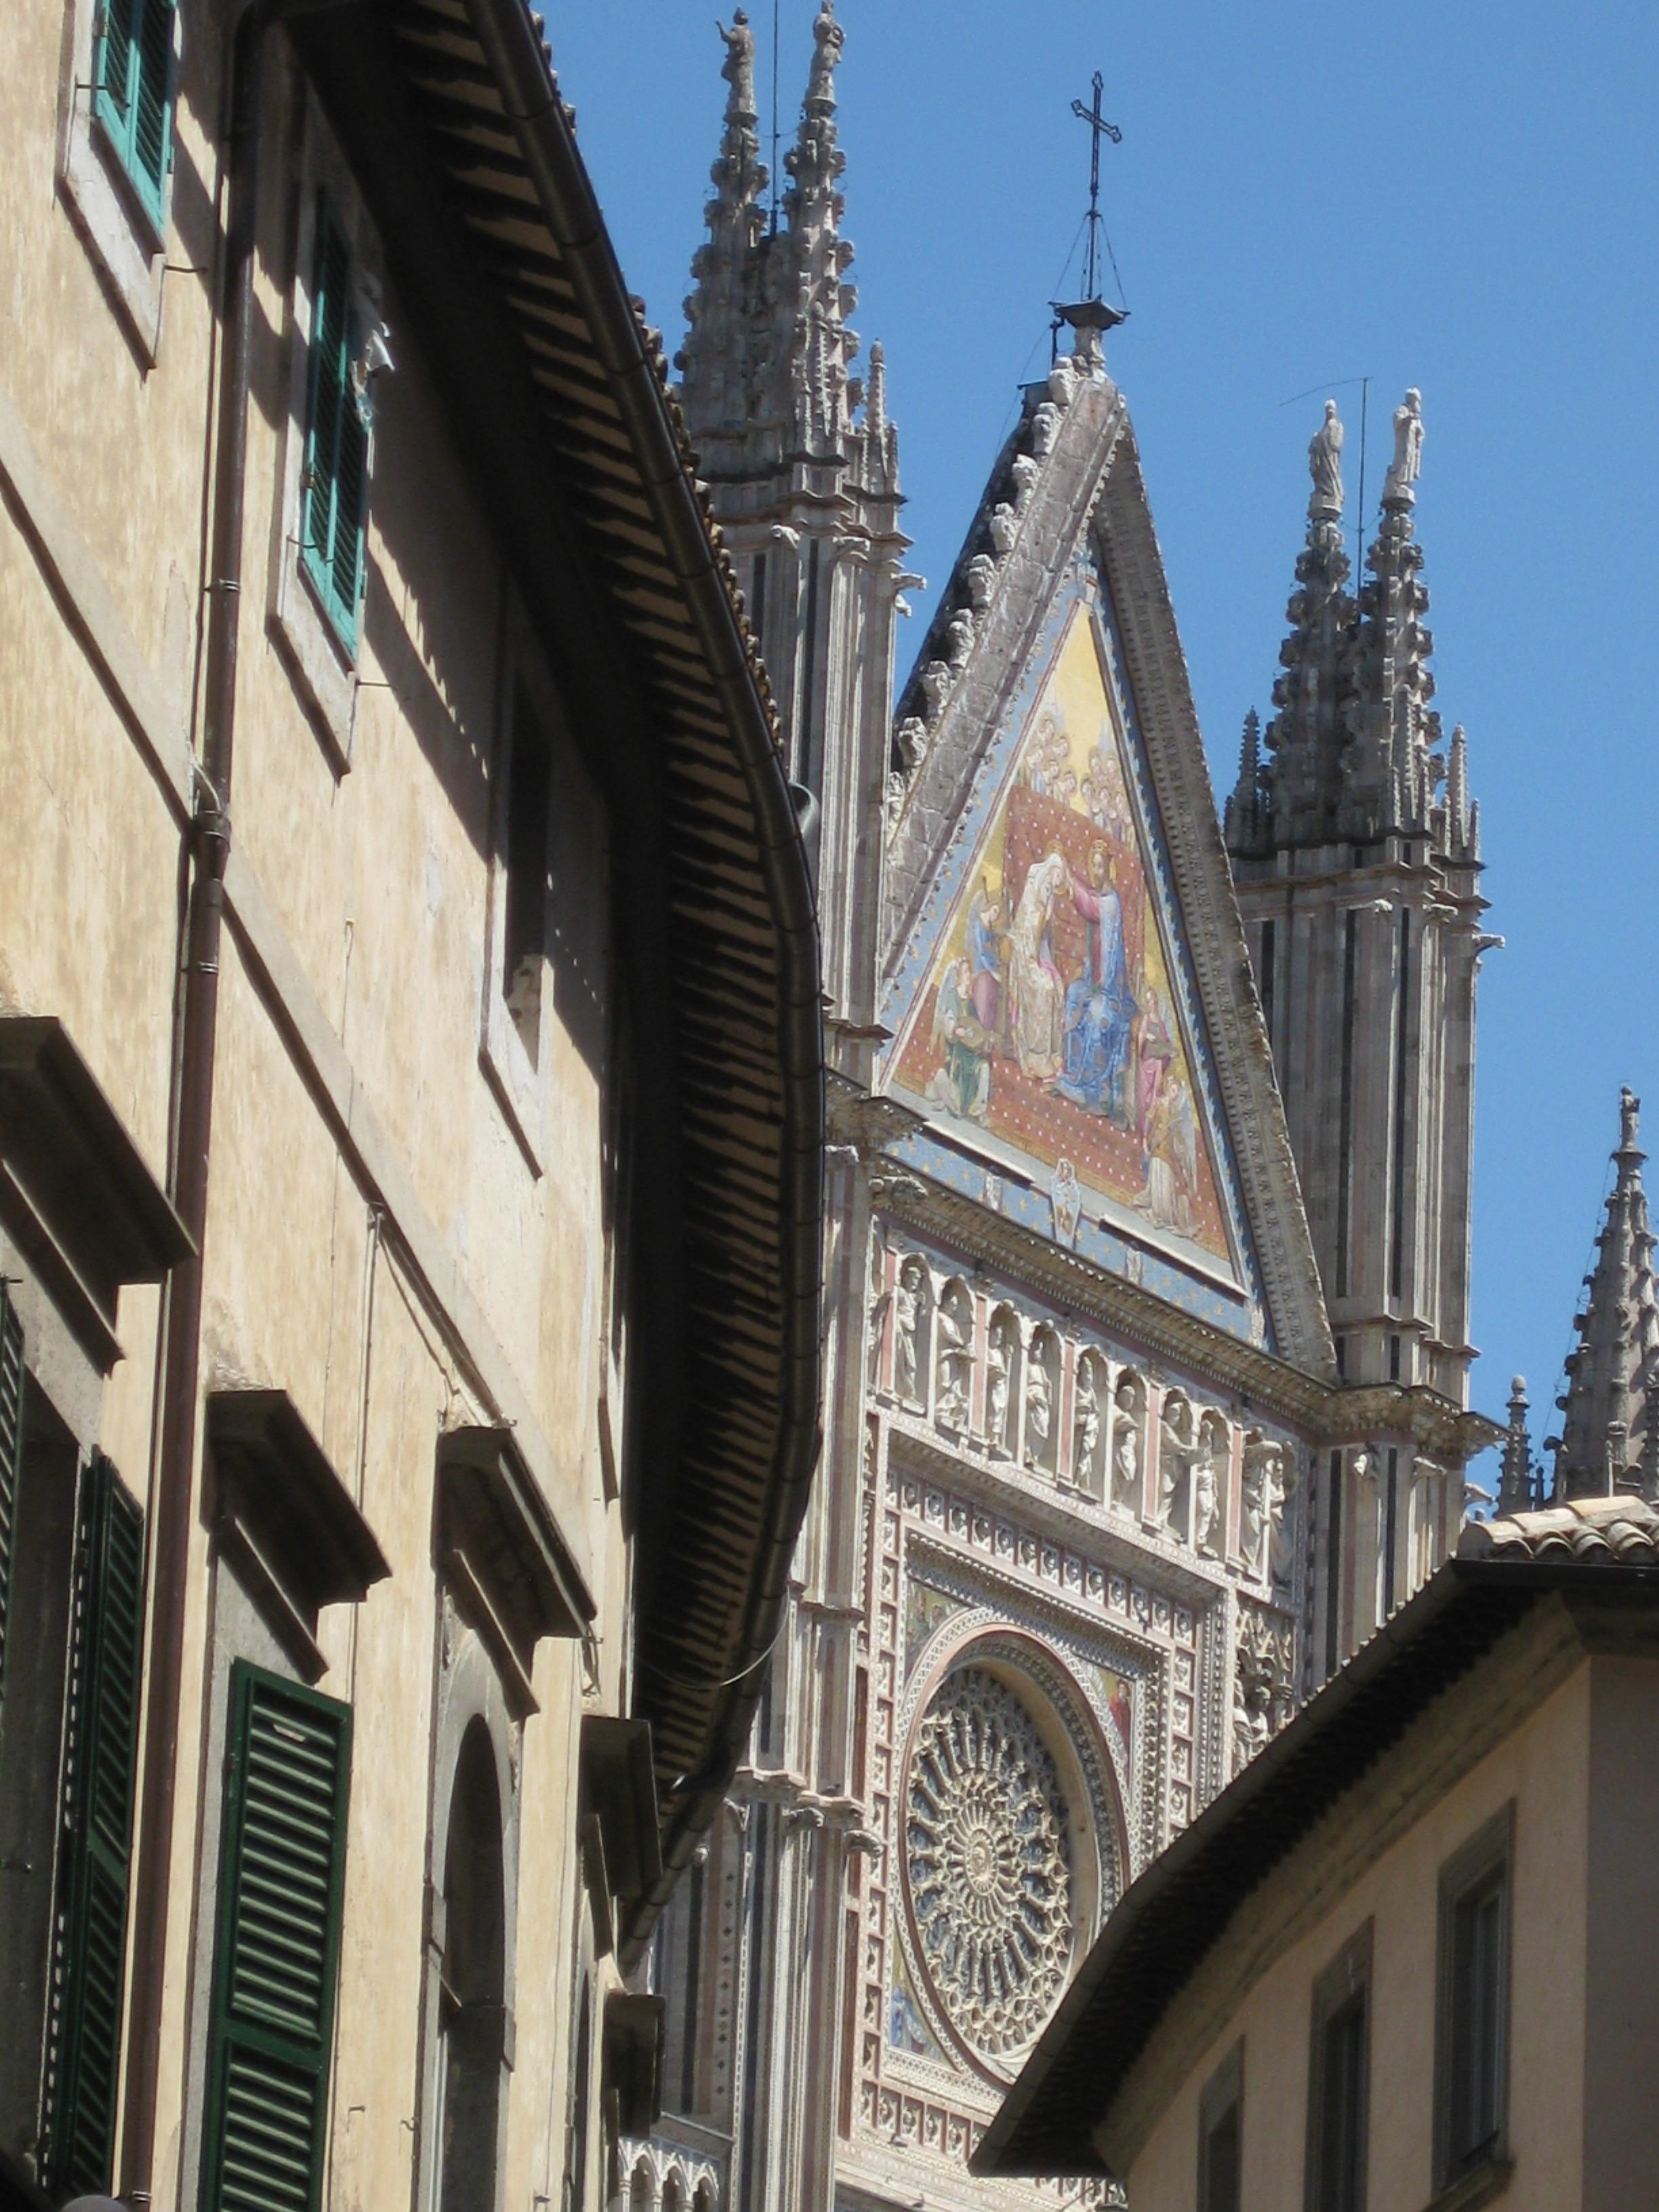 CRO Italy web 2012 - 07.JPG